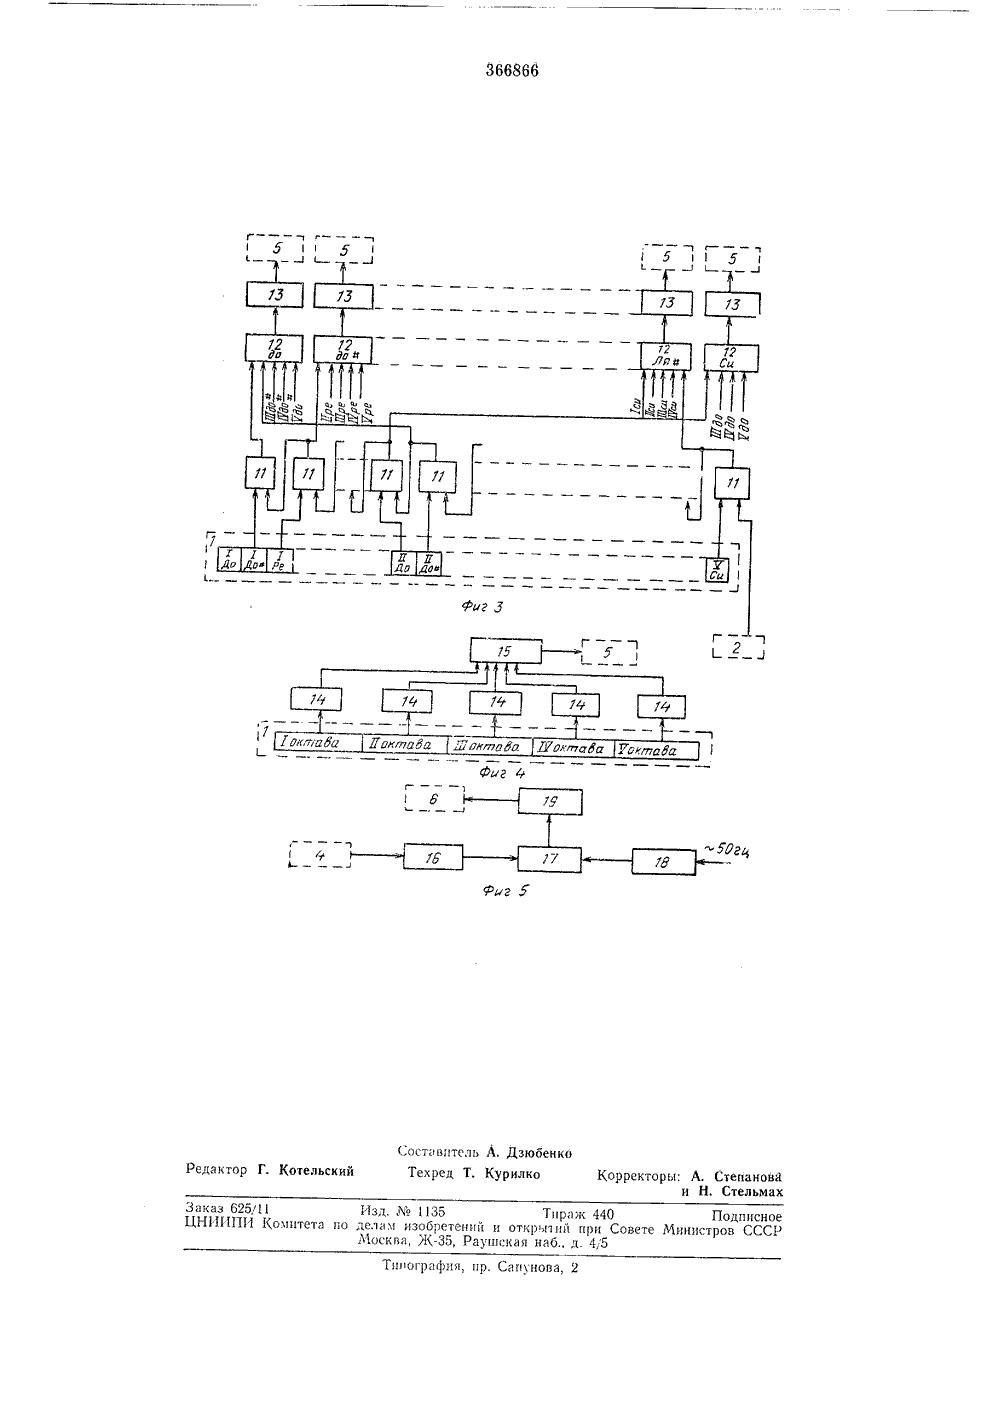 цветомузыка(схема) на 3 полярностях